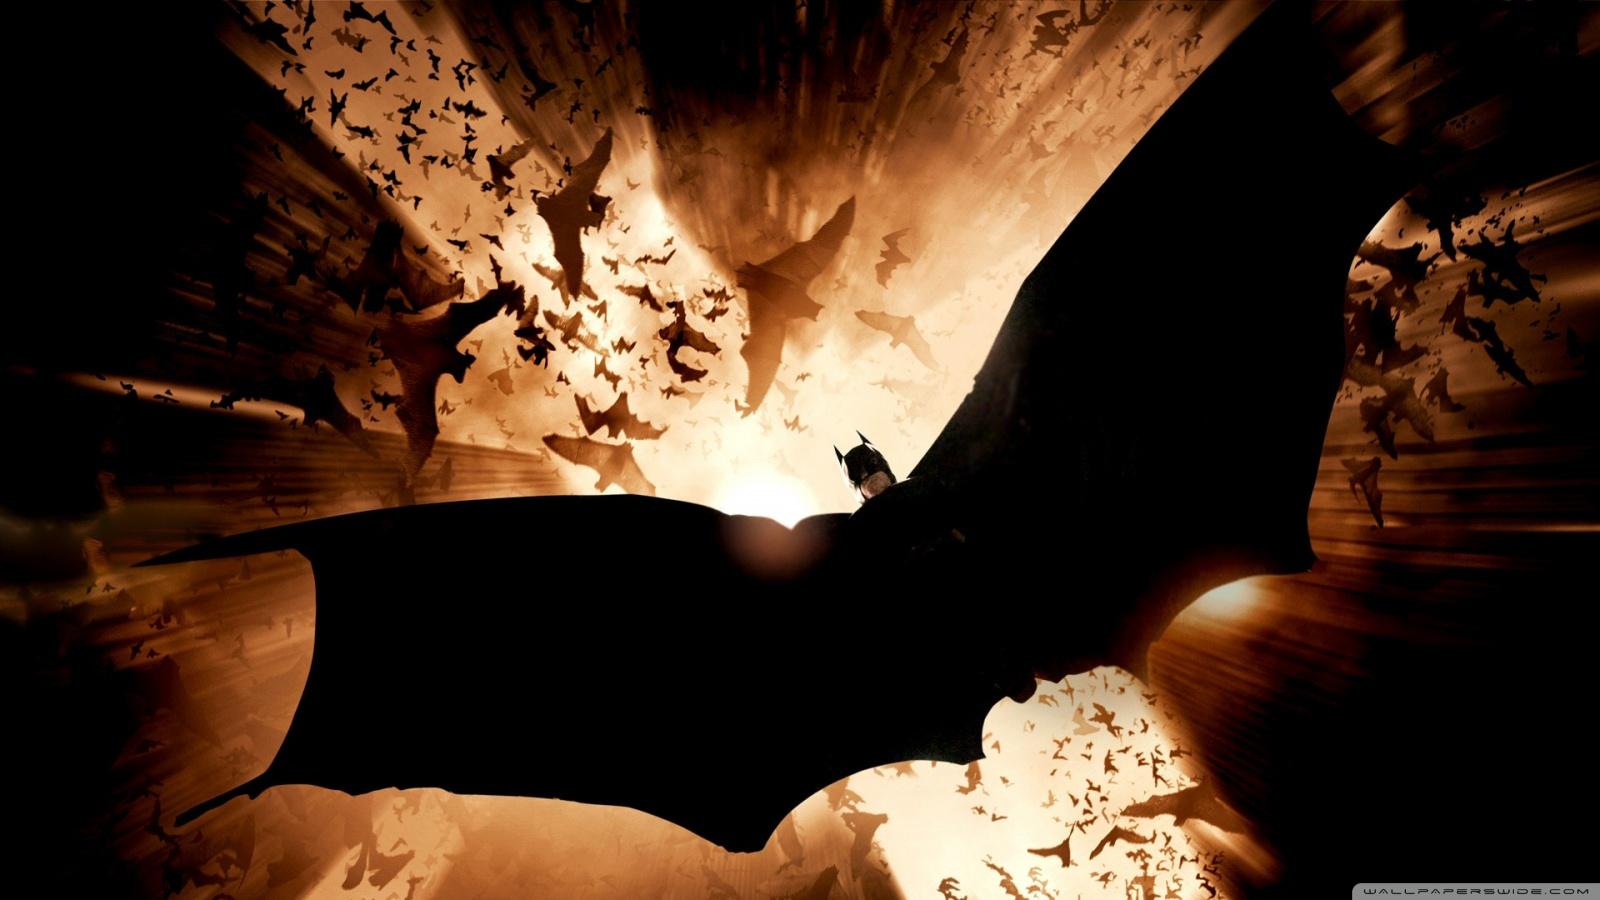 batman_begins_2-wallpaper-1600x900-1.jpg